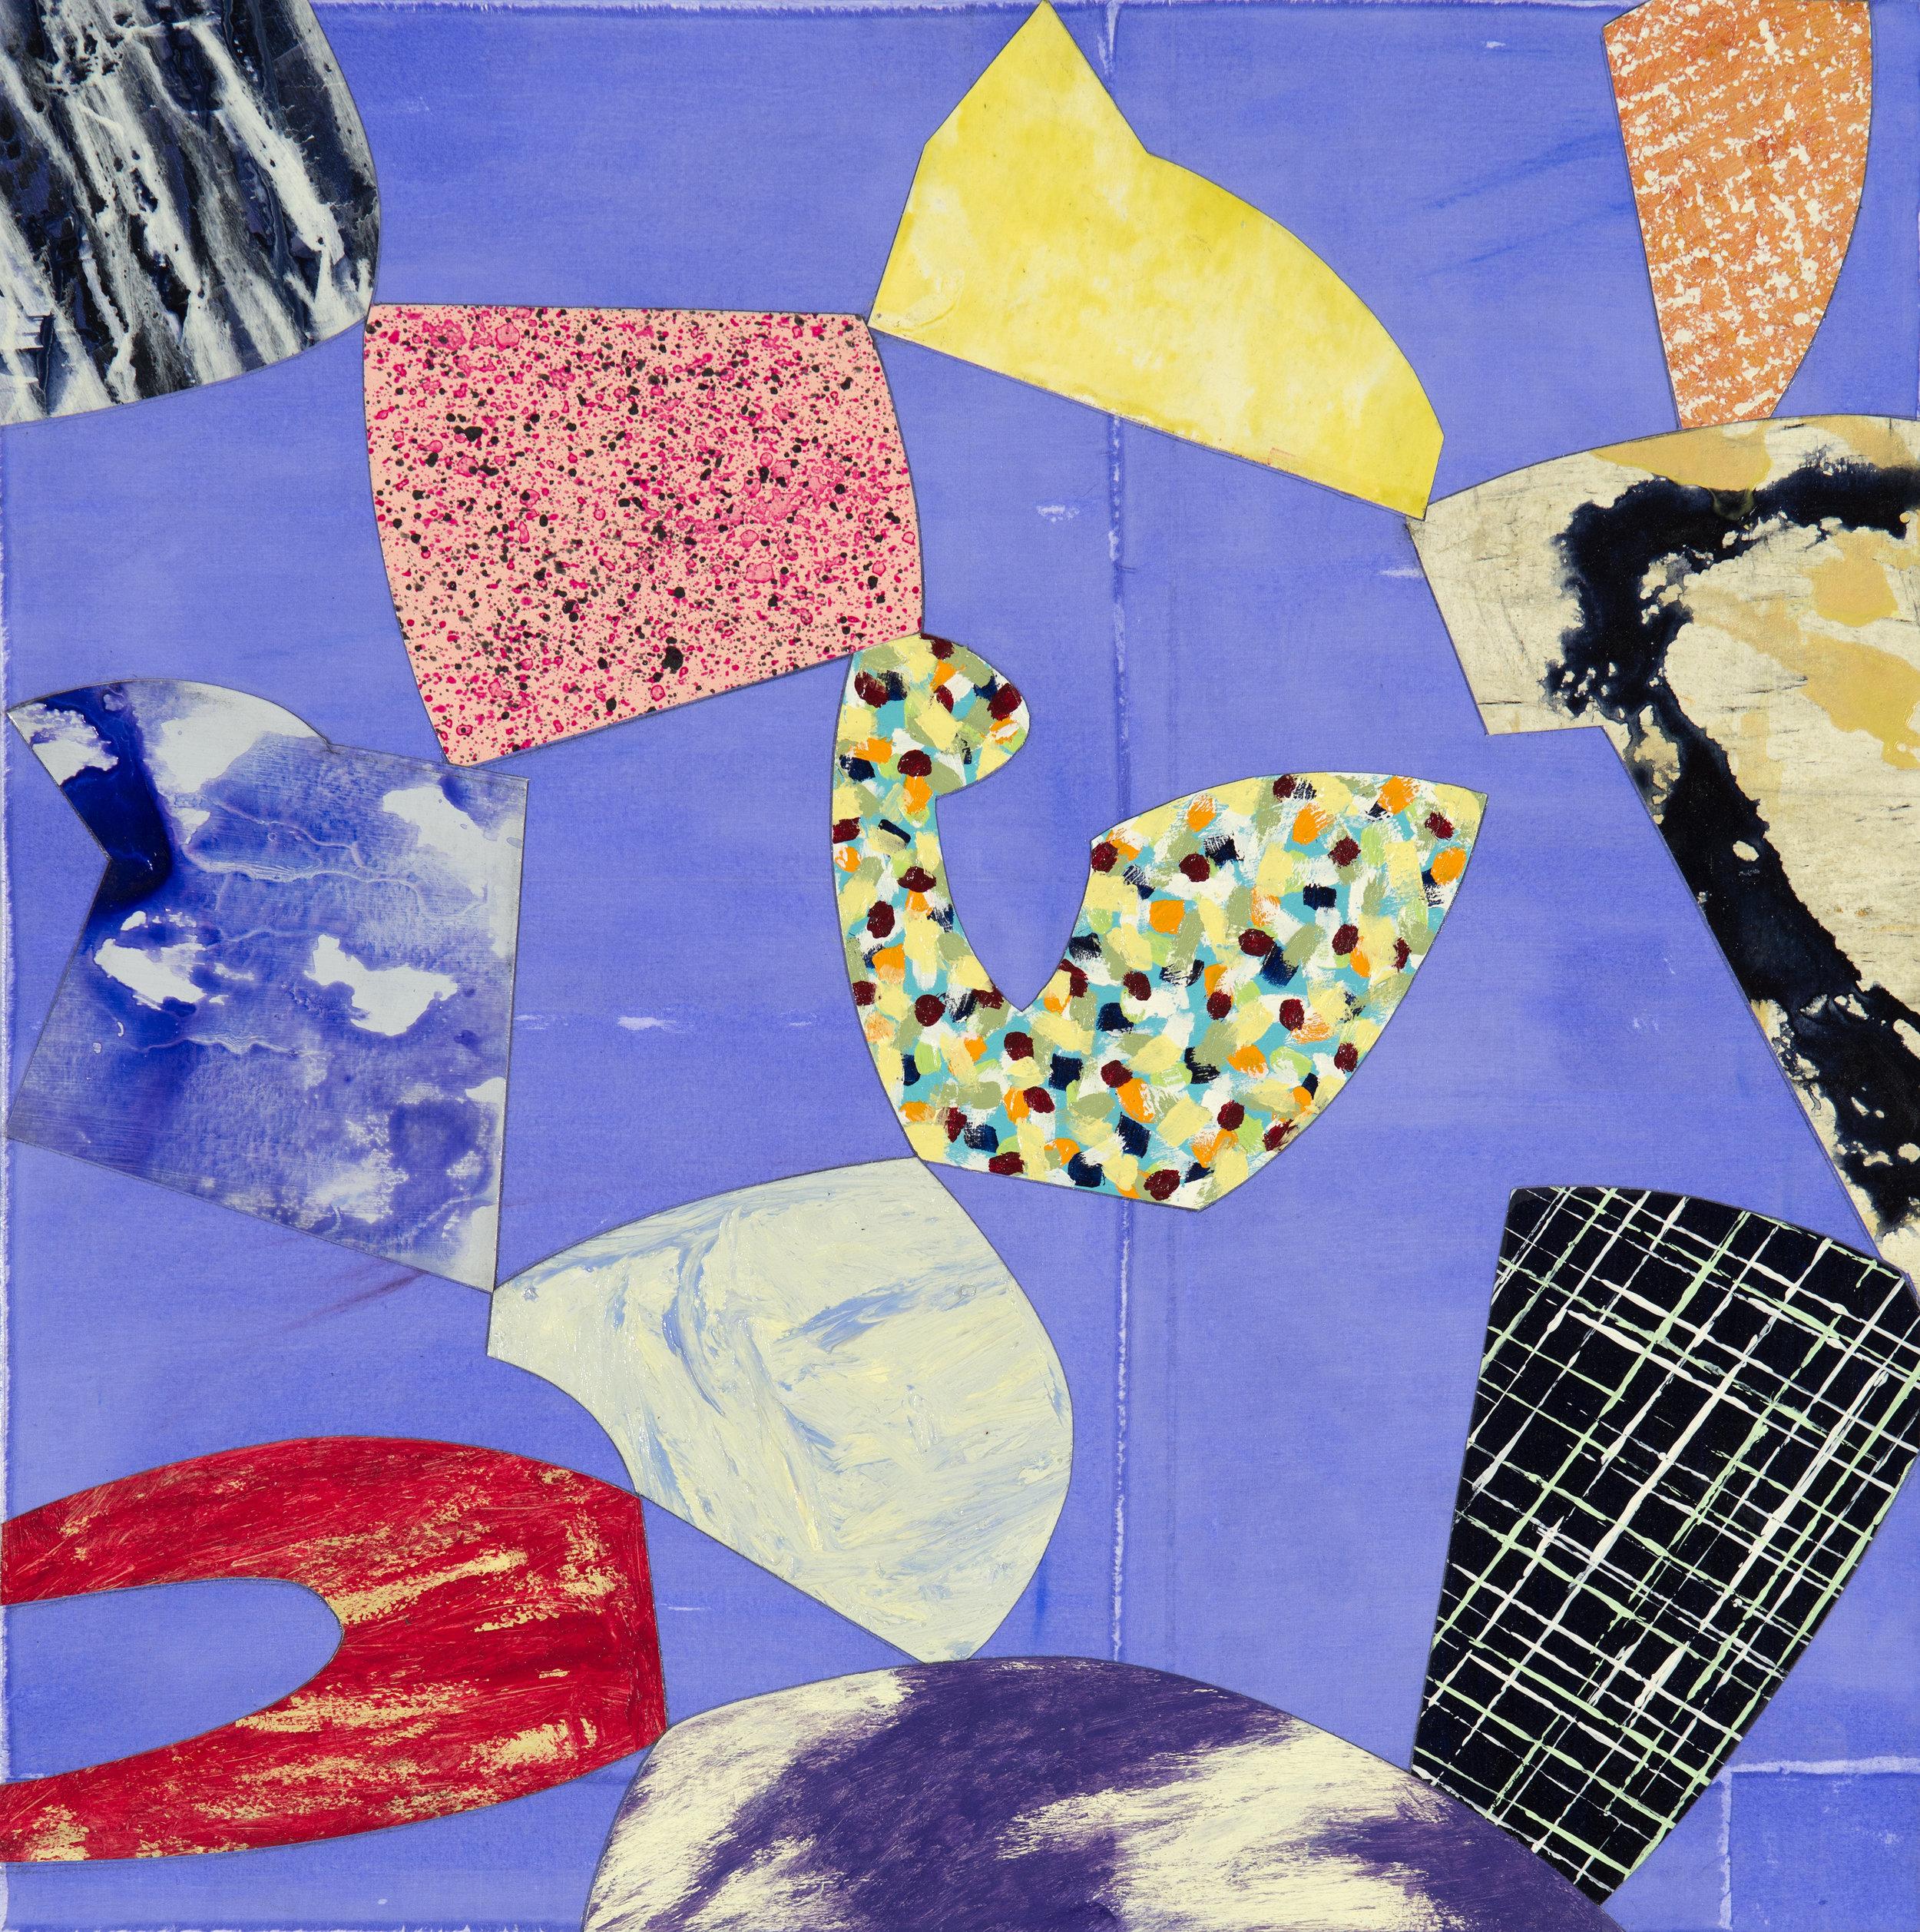 "Modern Dance/Pina   Jerrold Burchman  BU295  Mixed Media Collage on Canvas  20"" x 20"""